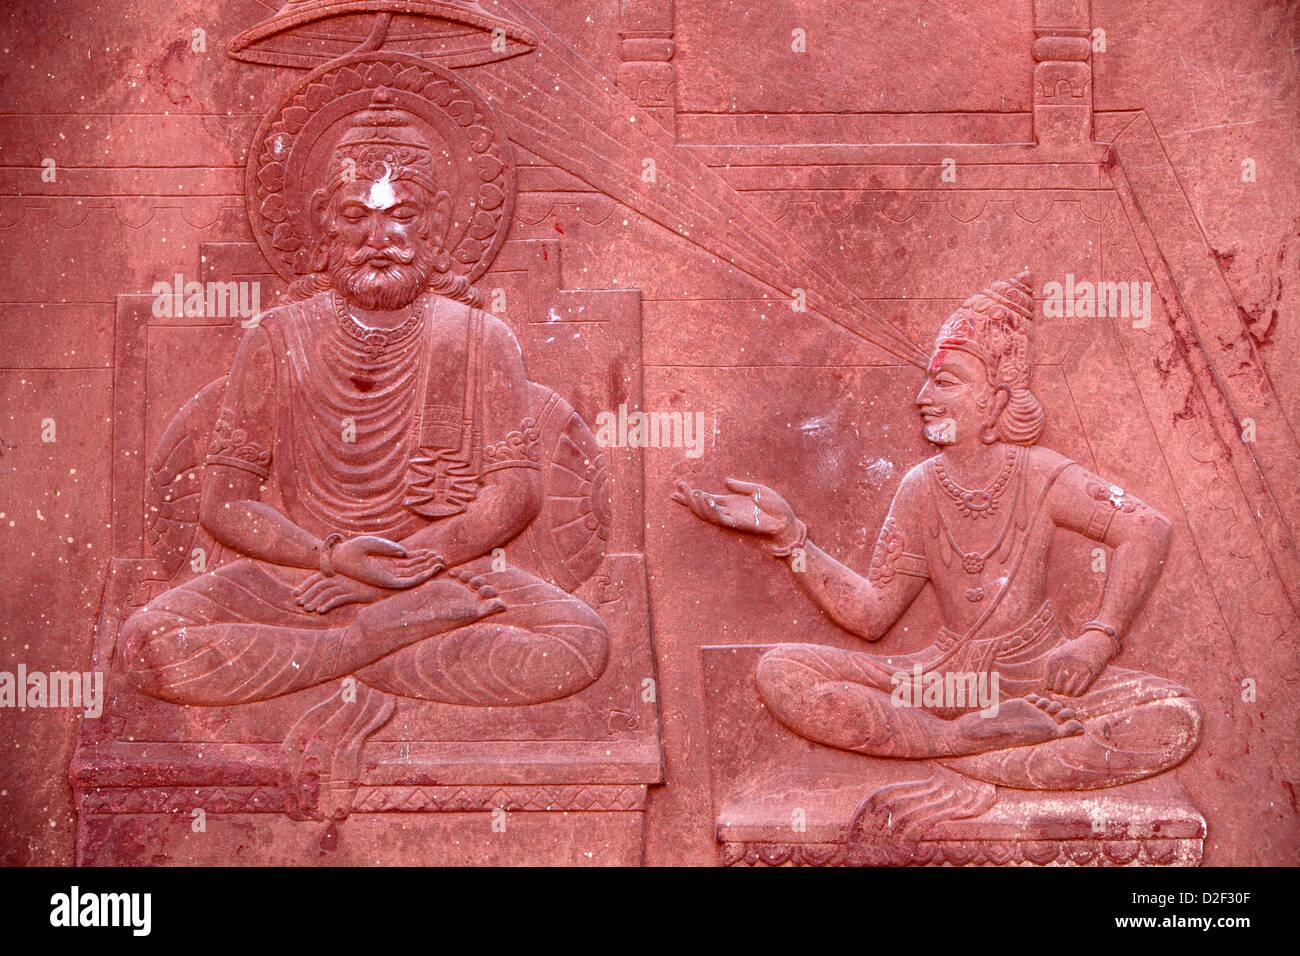 Bhagavad Gita engraved on a Hindu temple : dialogue between Krishna and Arjuna Vrindavan. India. - Stock Image